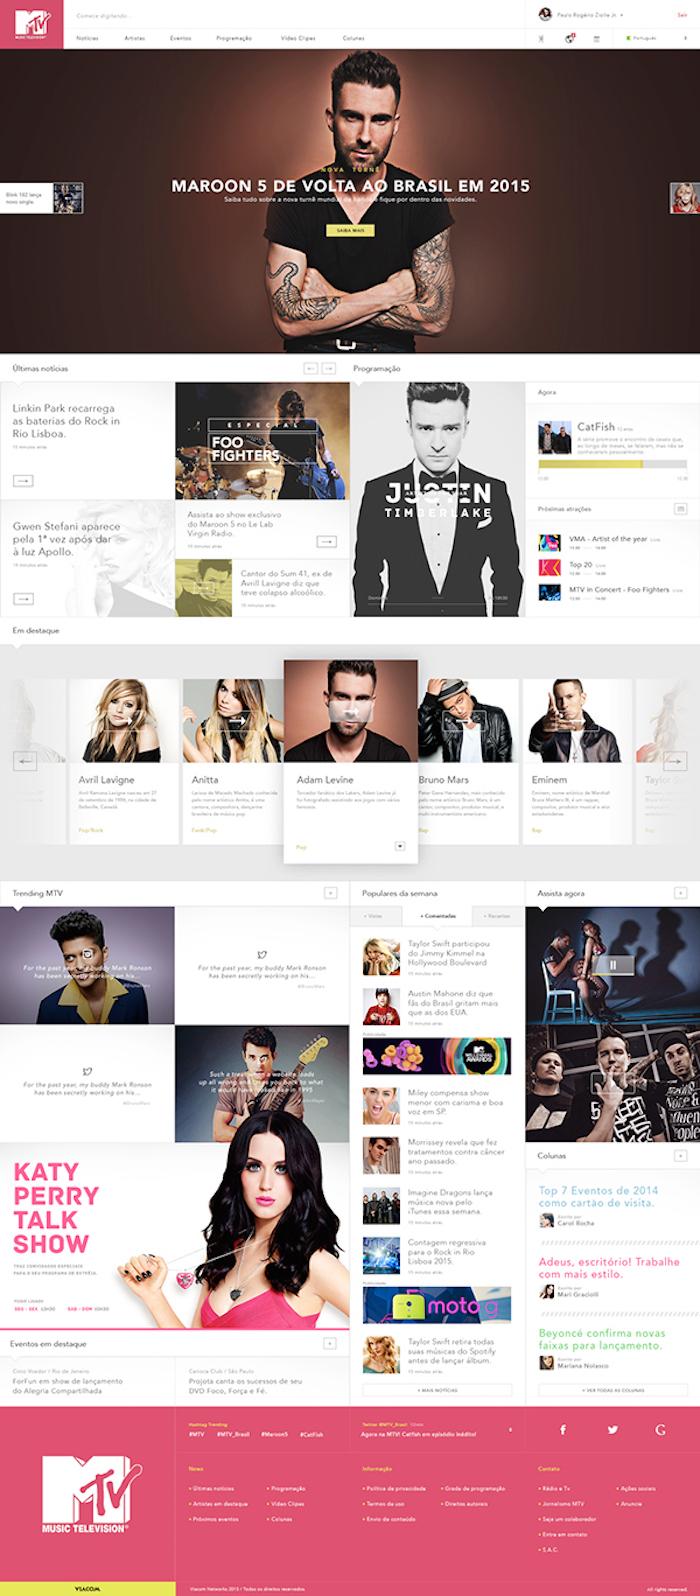 diseños web diciembre 2014 img 4